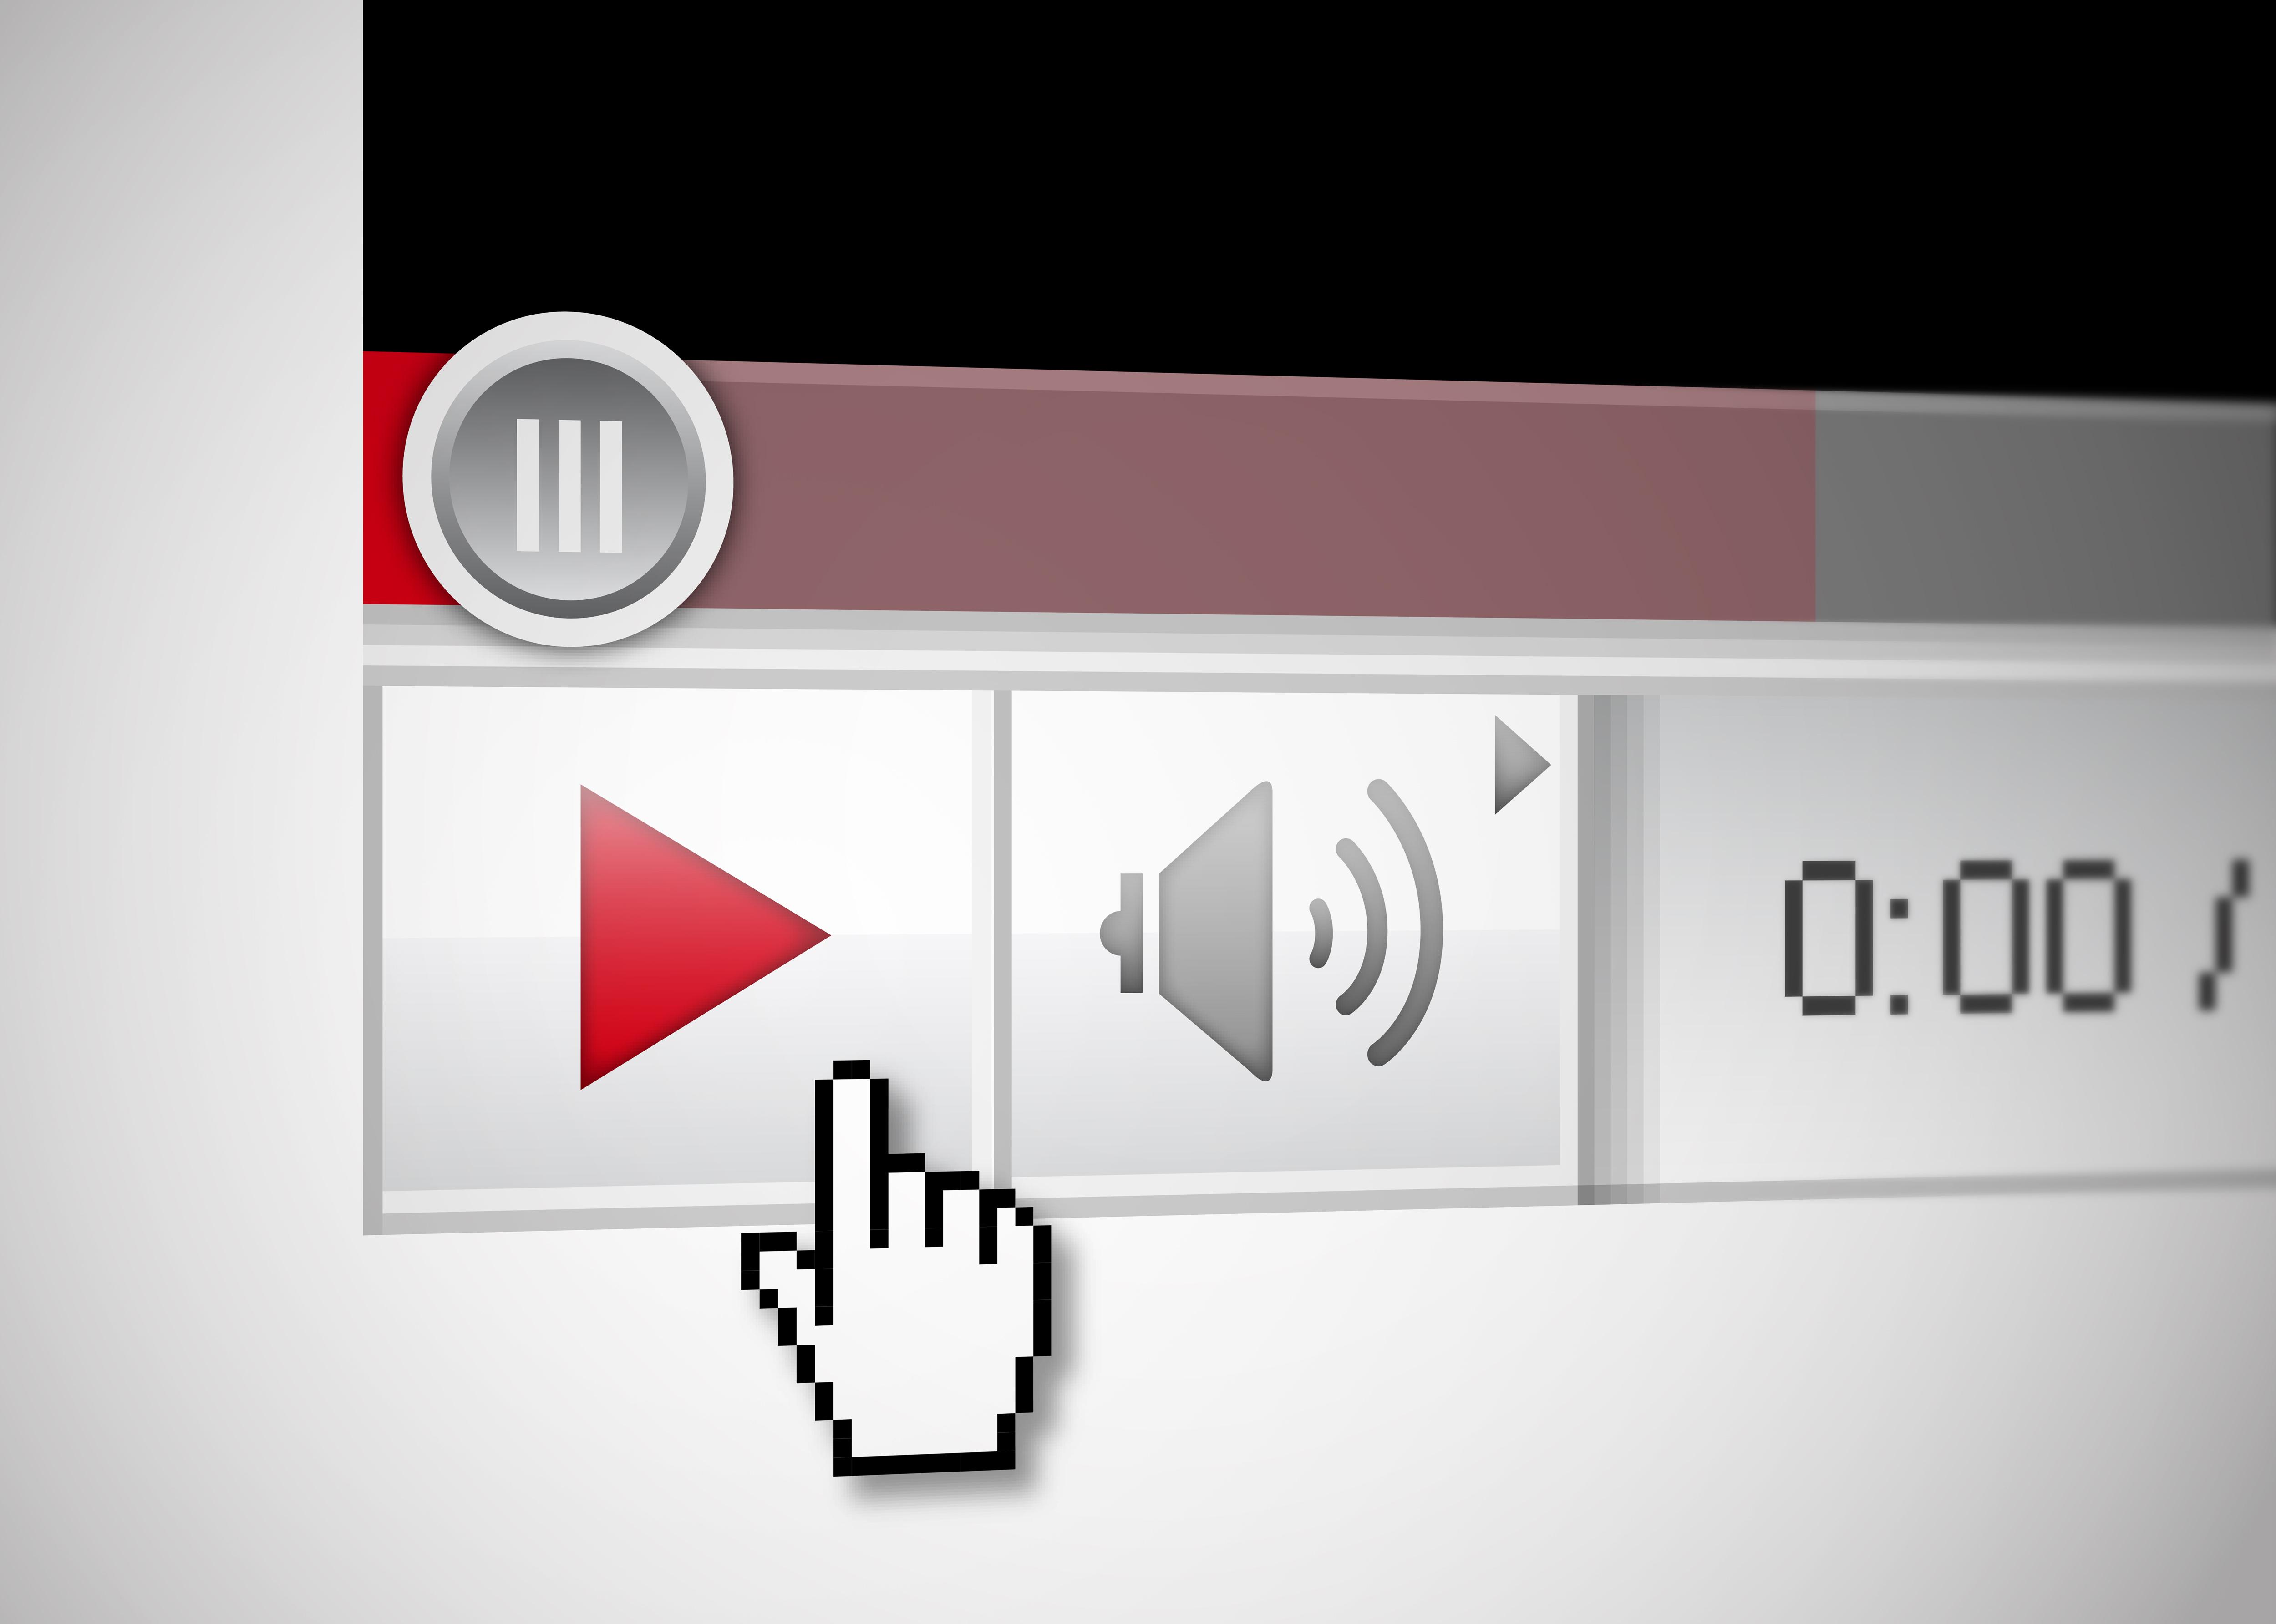 VideoPlayerImage